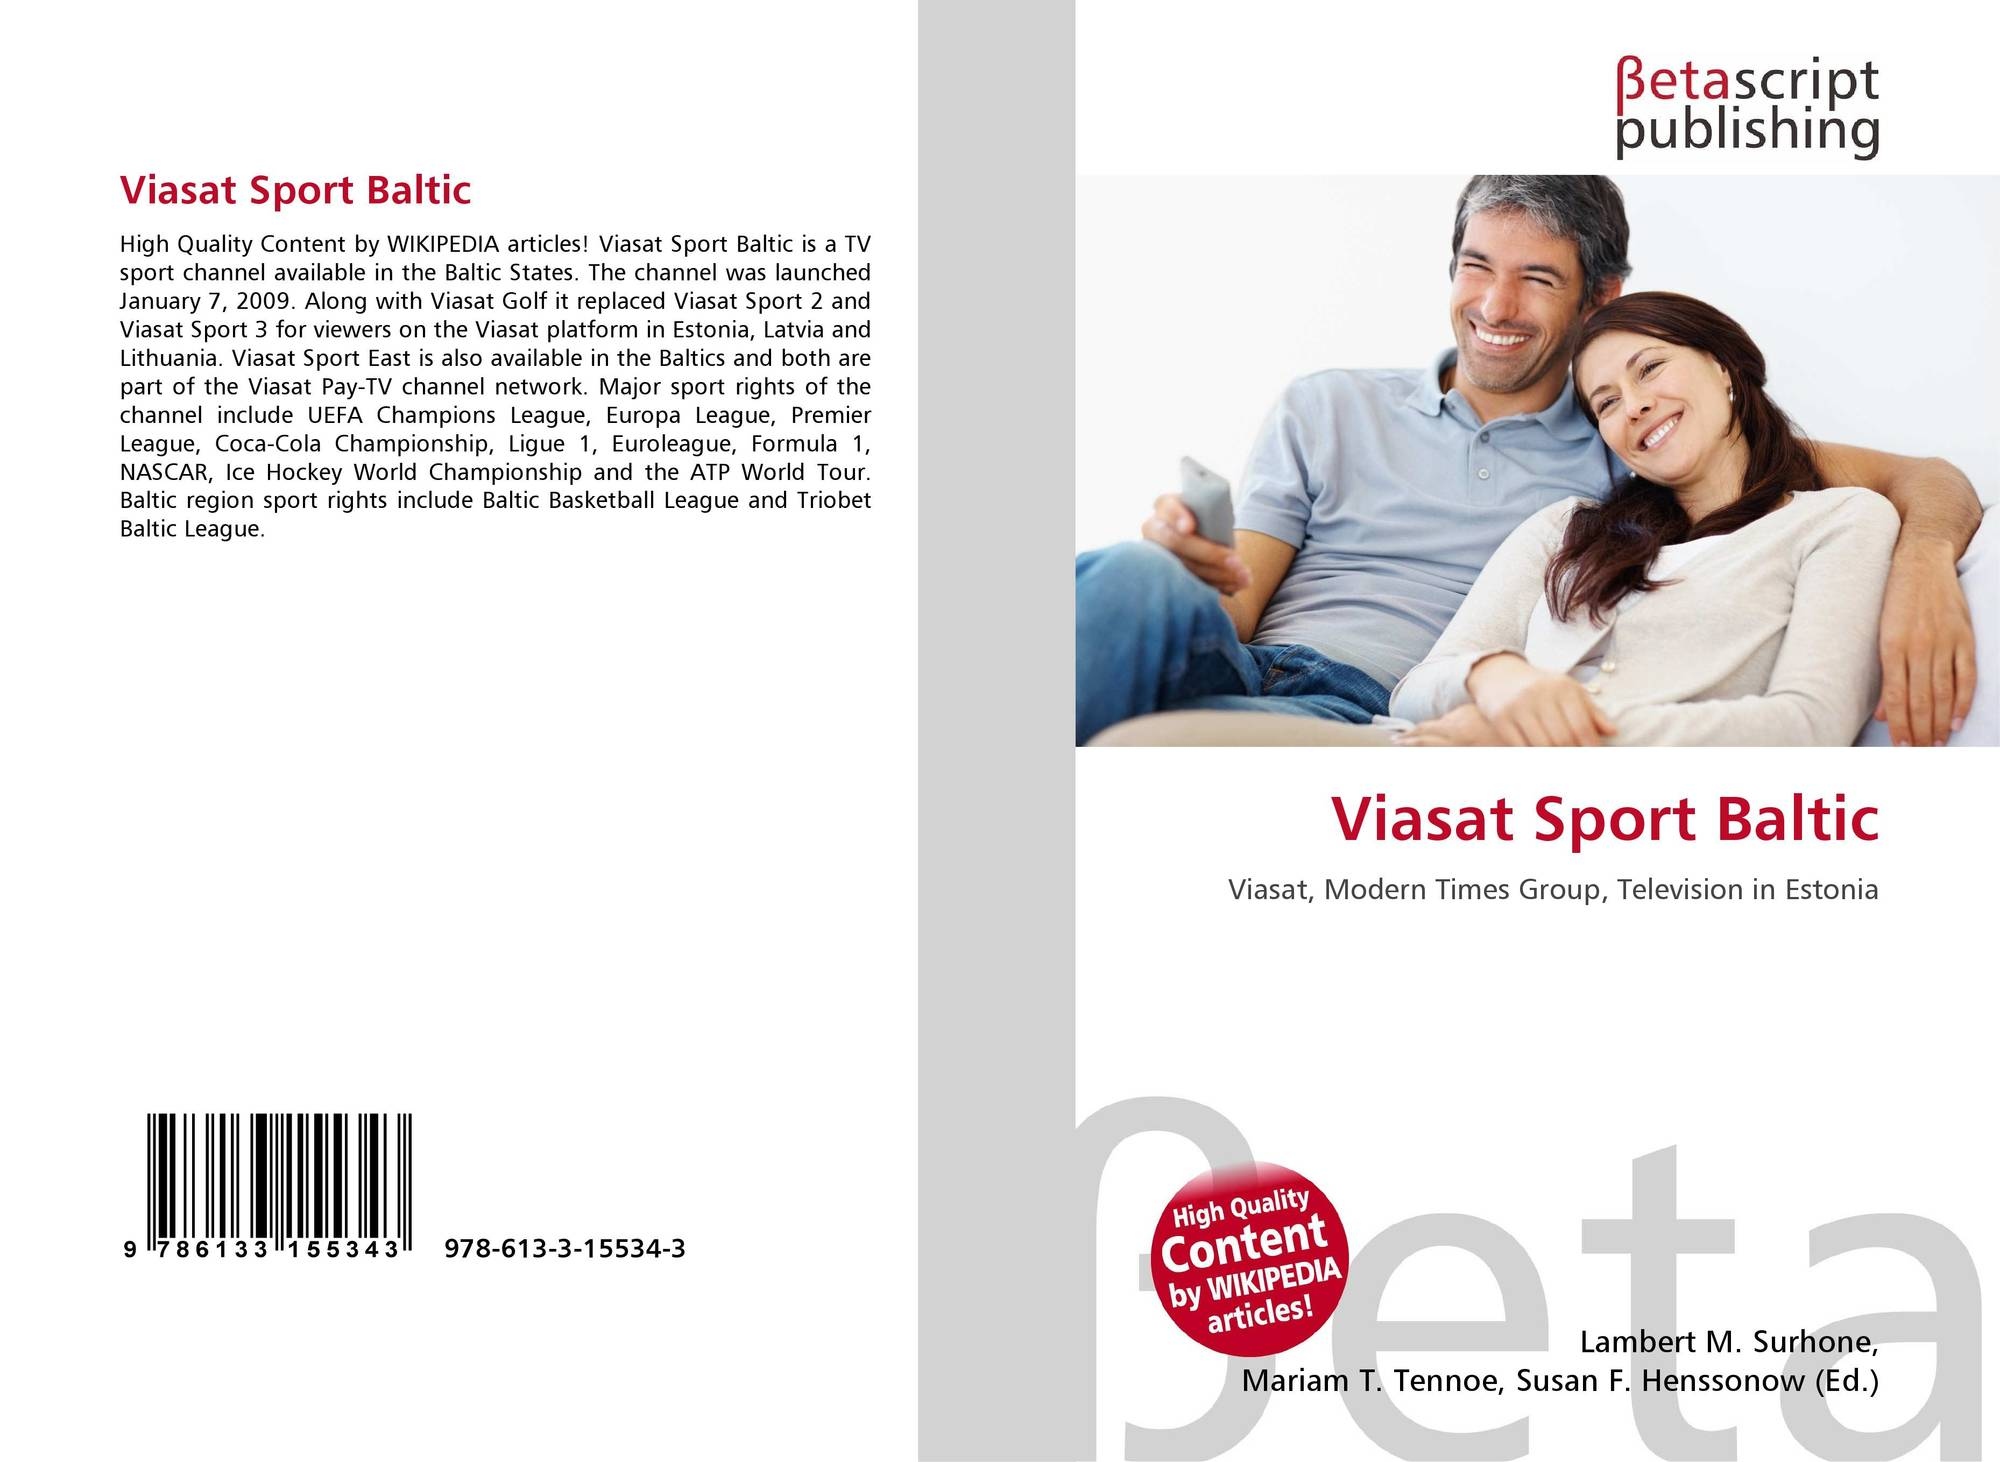 Viasat Sport Baltic, 978-613-3-15534-3, 6133155345